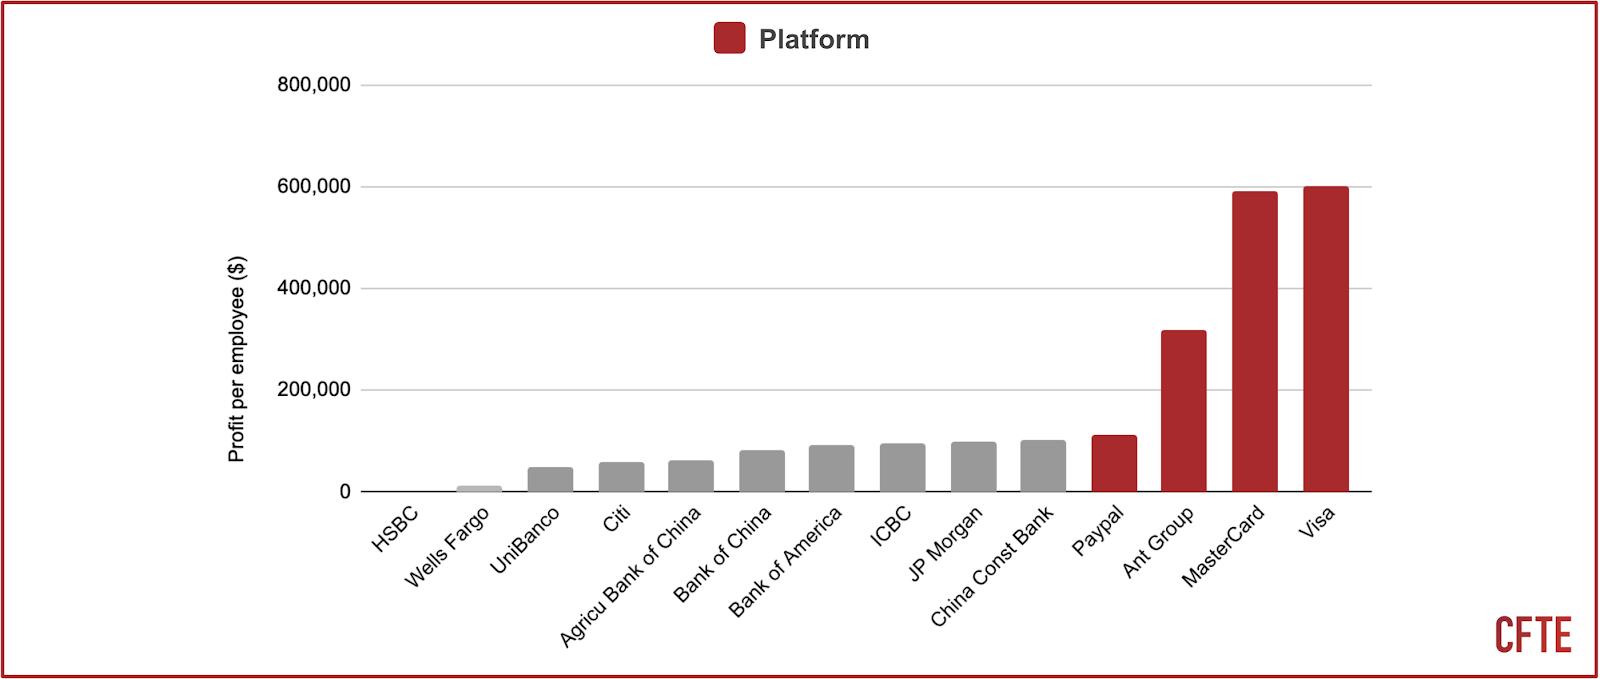 a graph that shows the profit per employee of platform vs non-platform financial institutions.